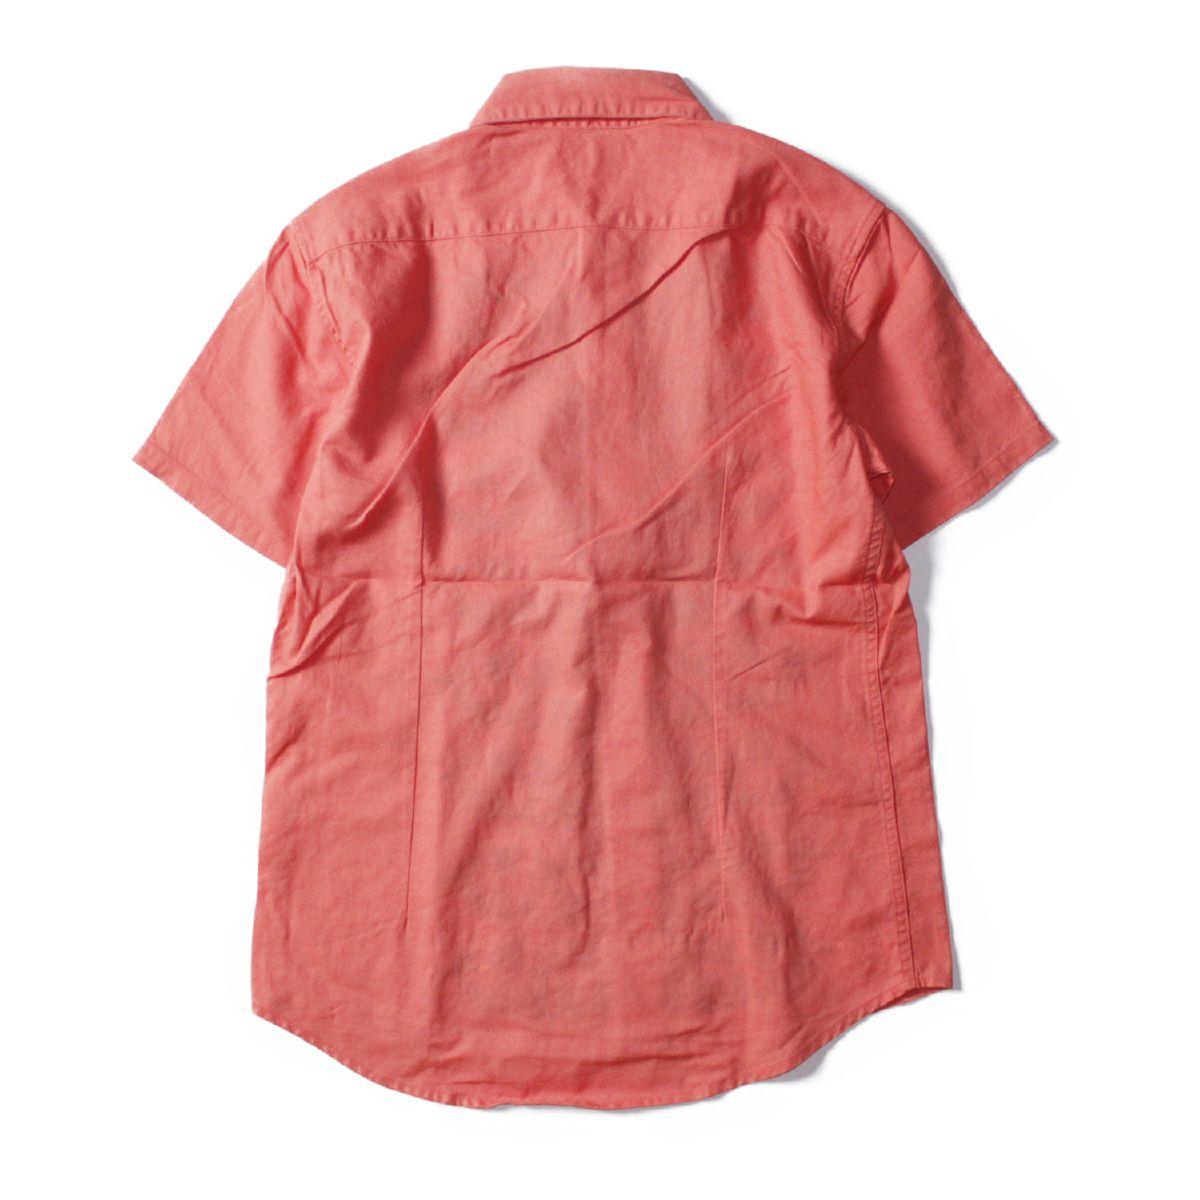 【50%OFF】BACK HEAD バックヘッド 刺繍シャツ